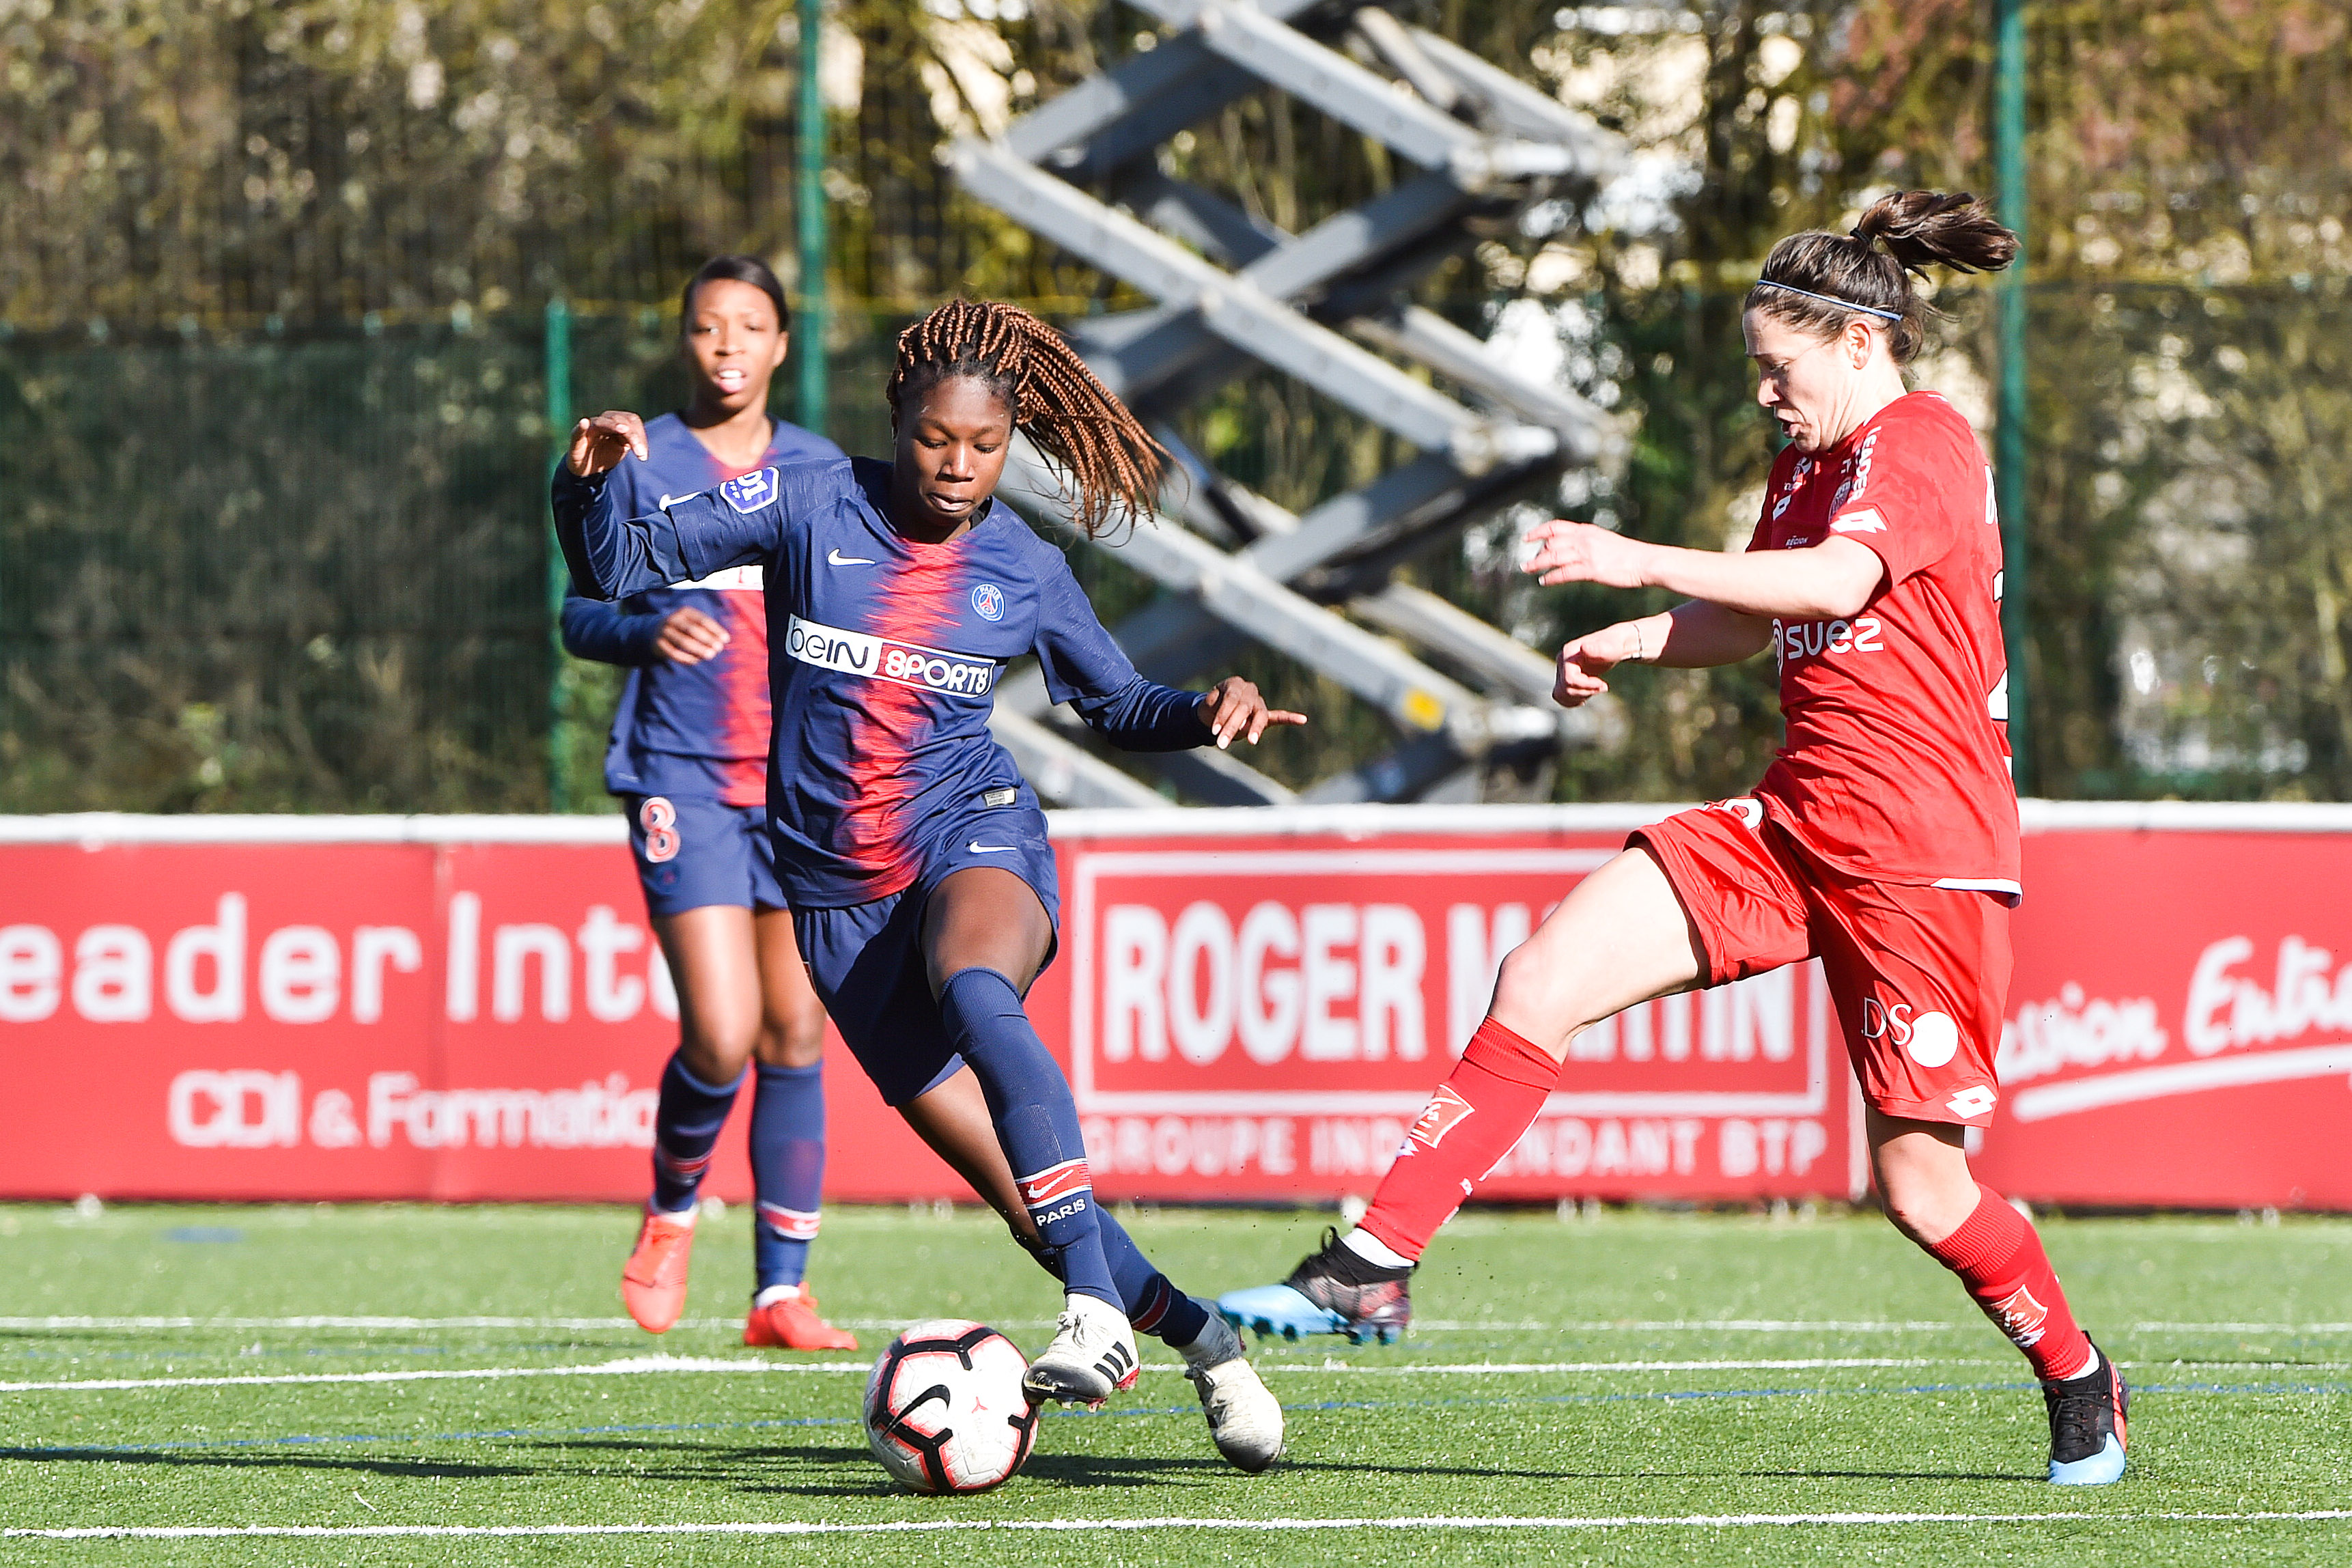 Dijon FCO v Paris Saint Germain - Women's Division 1